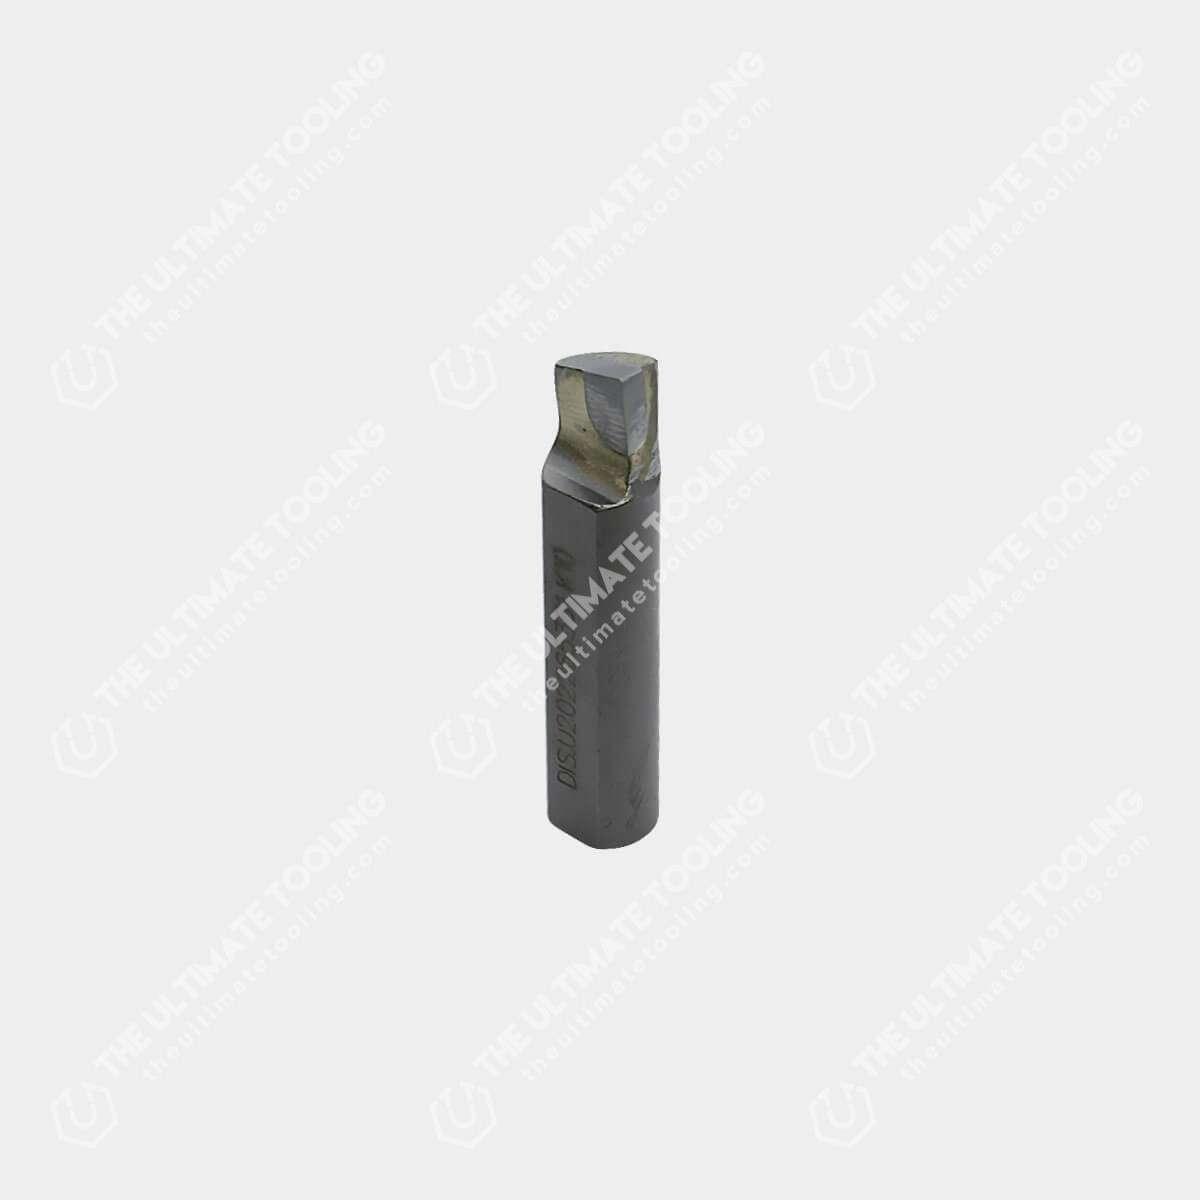 Berco AC 650 utensile di alesatura-1U202265361